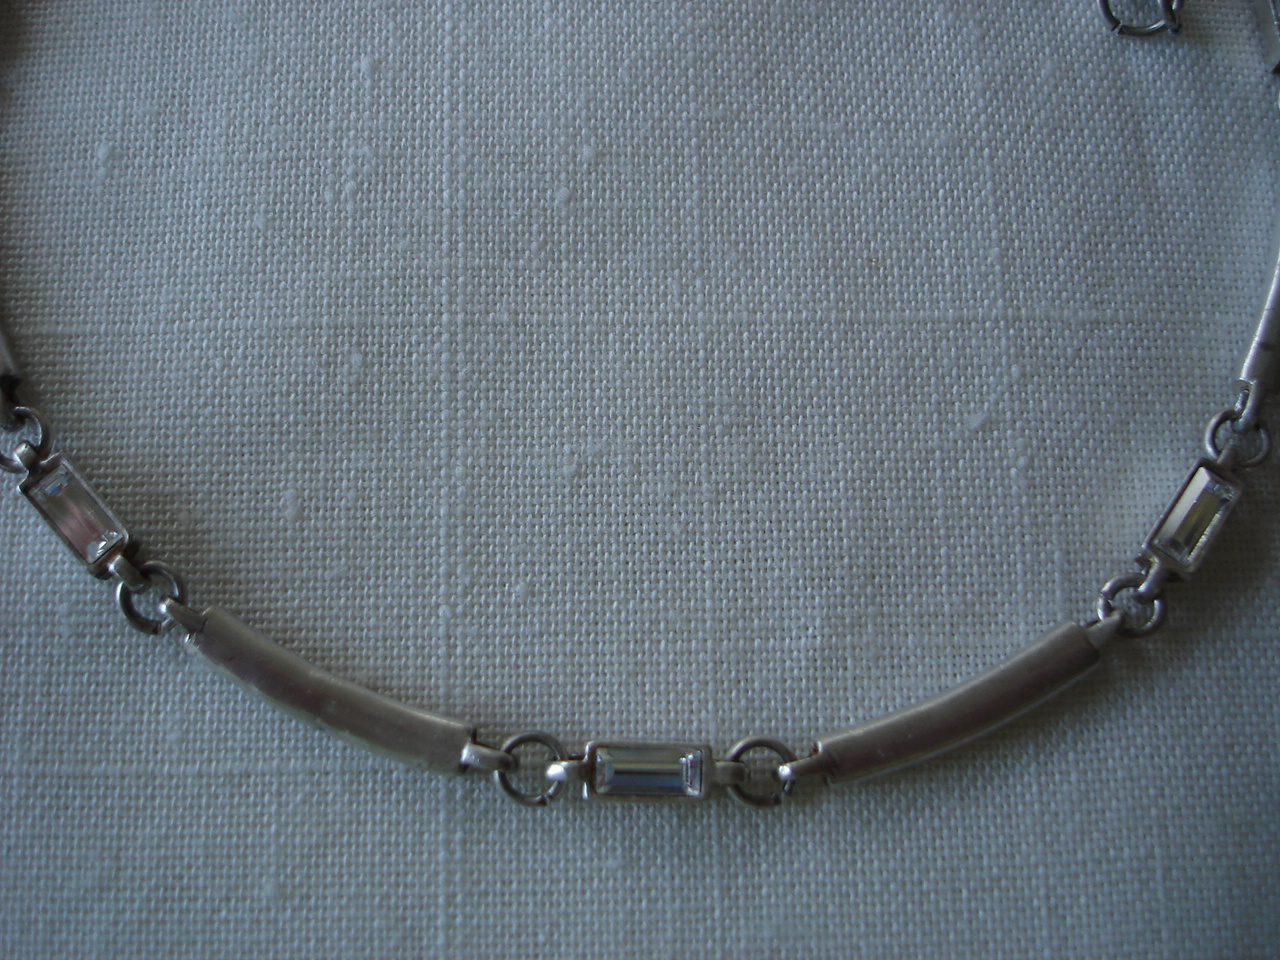 Vintage Silverplated Bar Link Choker Necklace, Bracelet